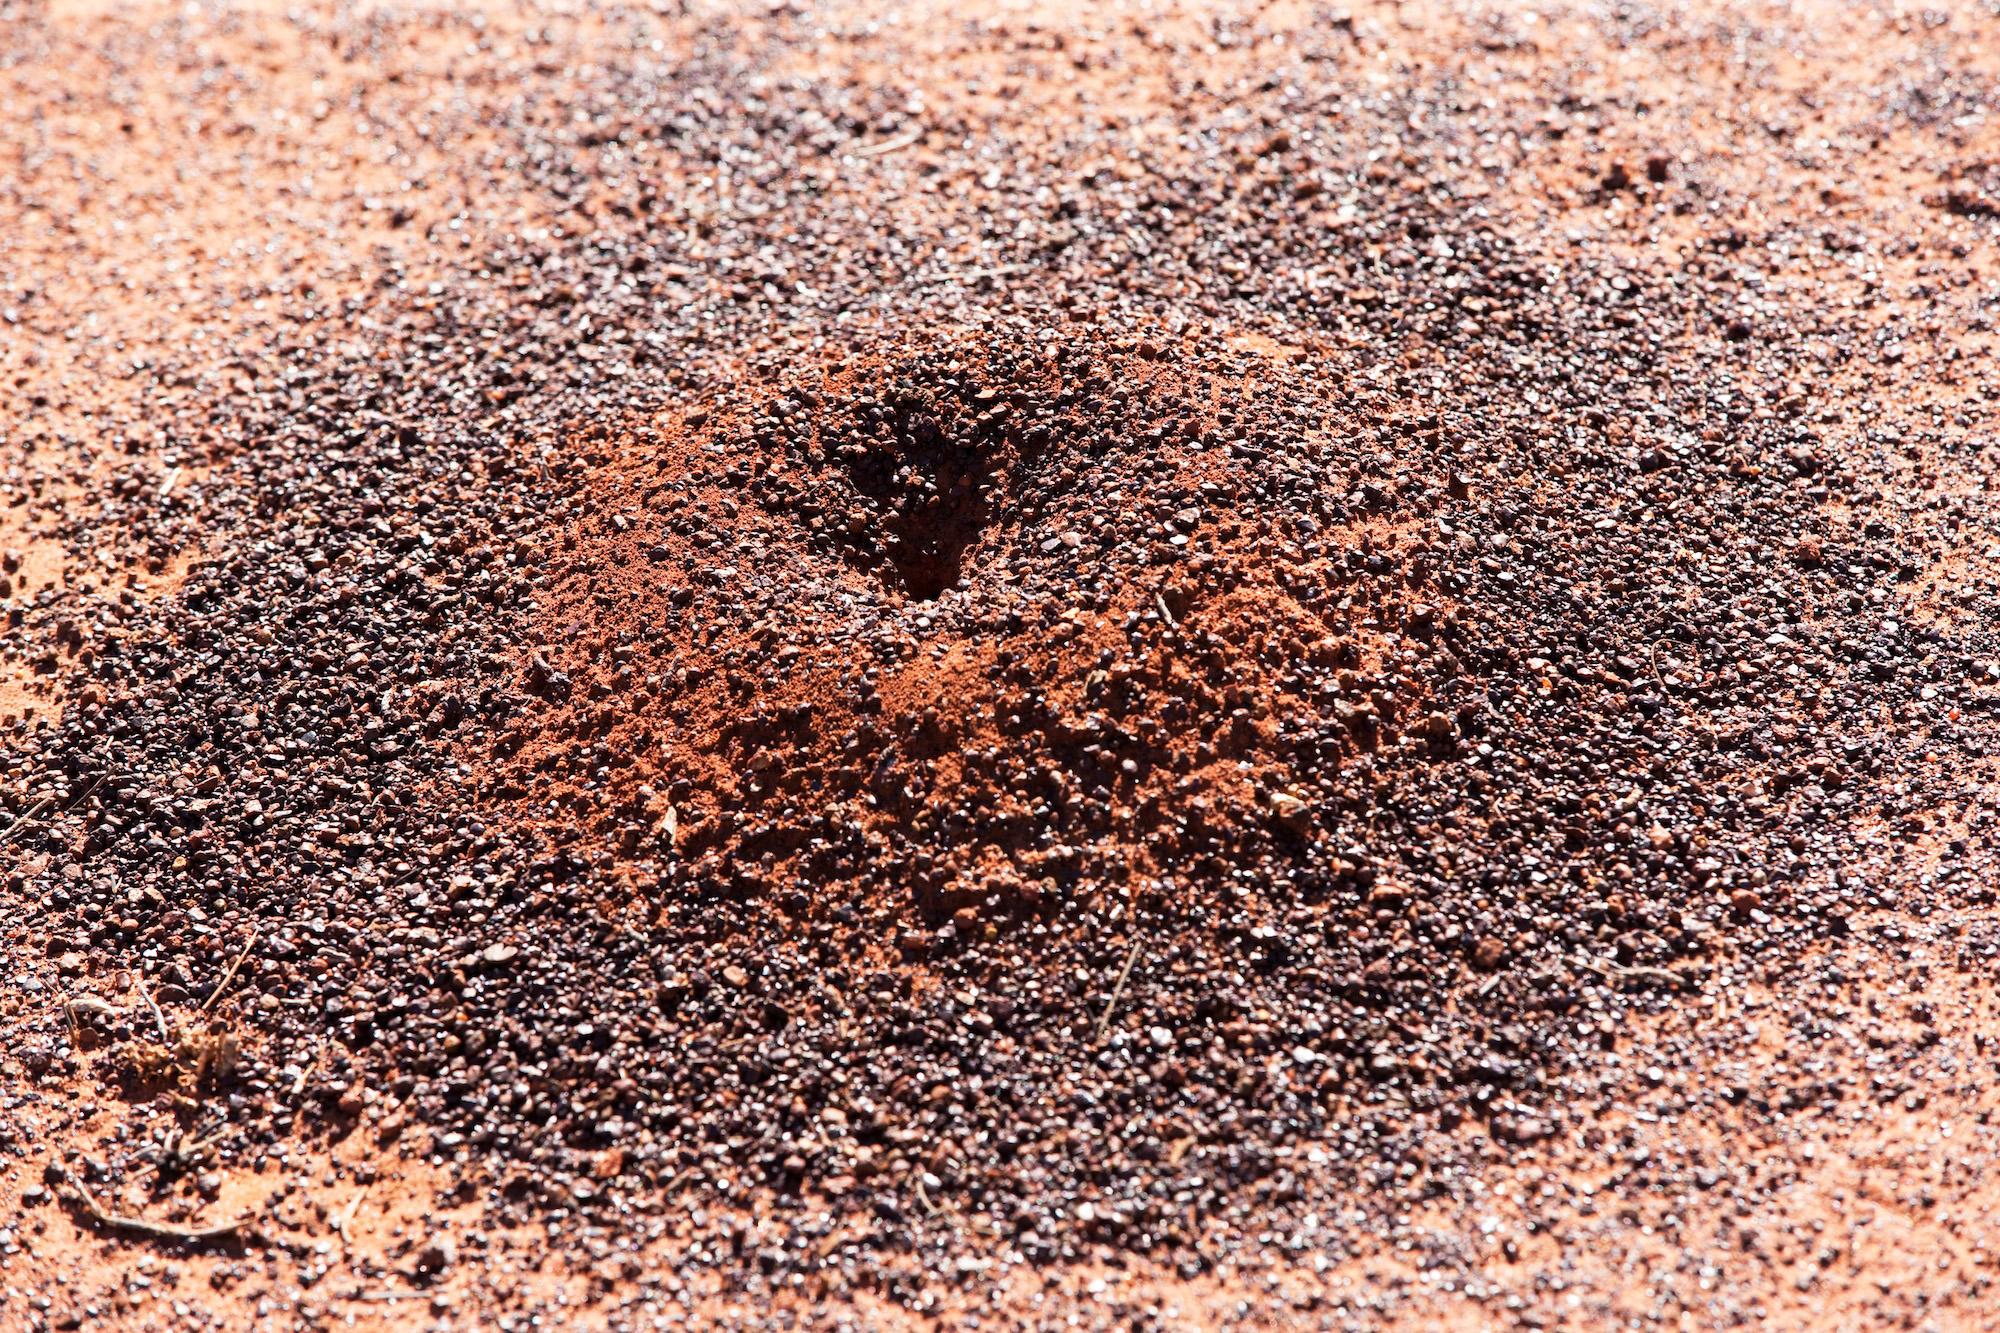 Ant Hill, Winton, Queensland, Australia, 2013